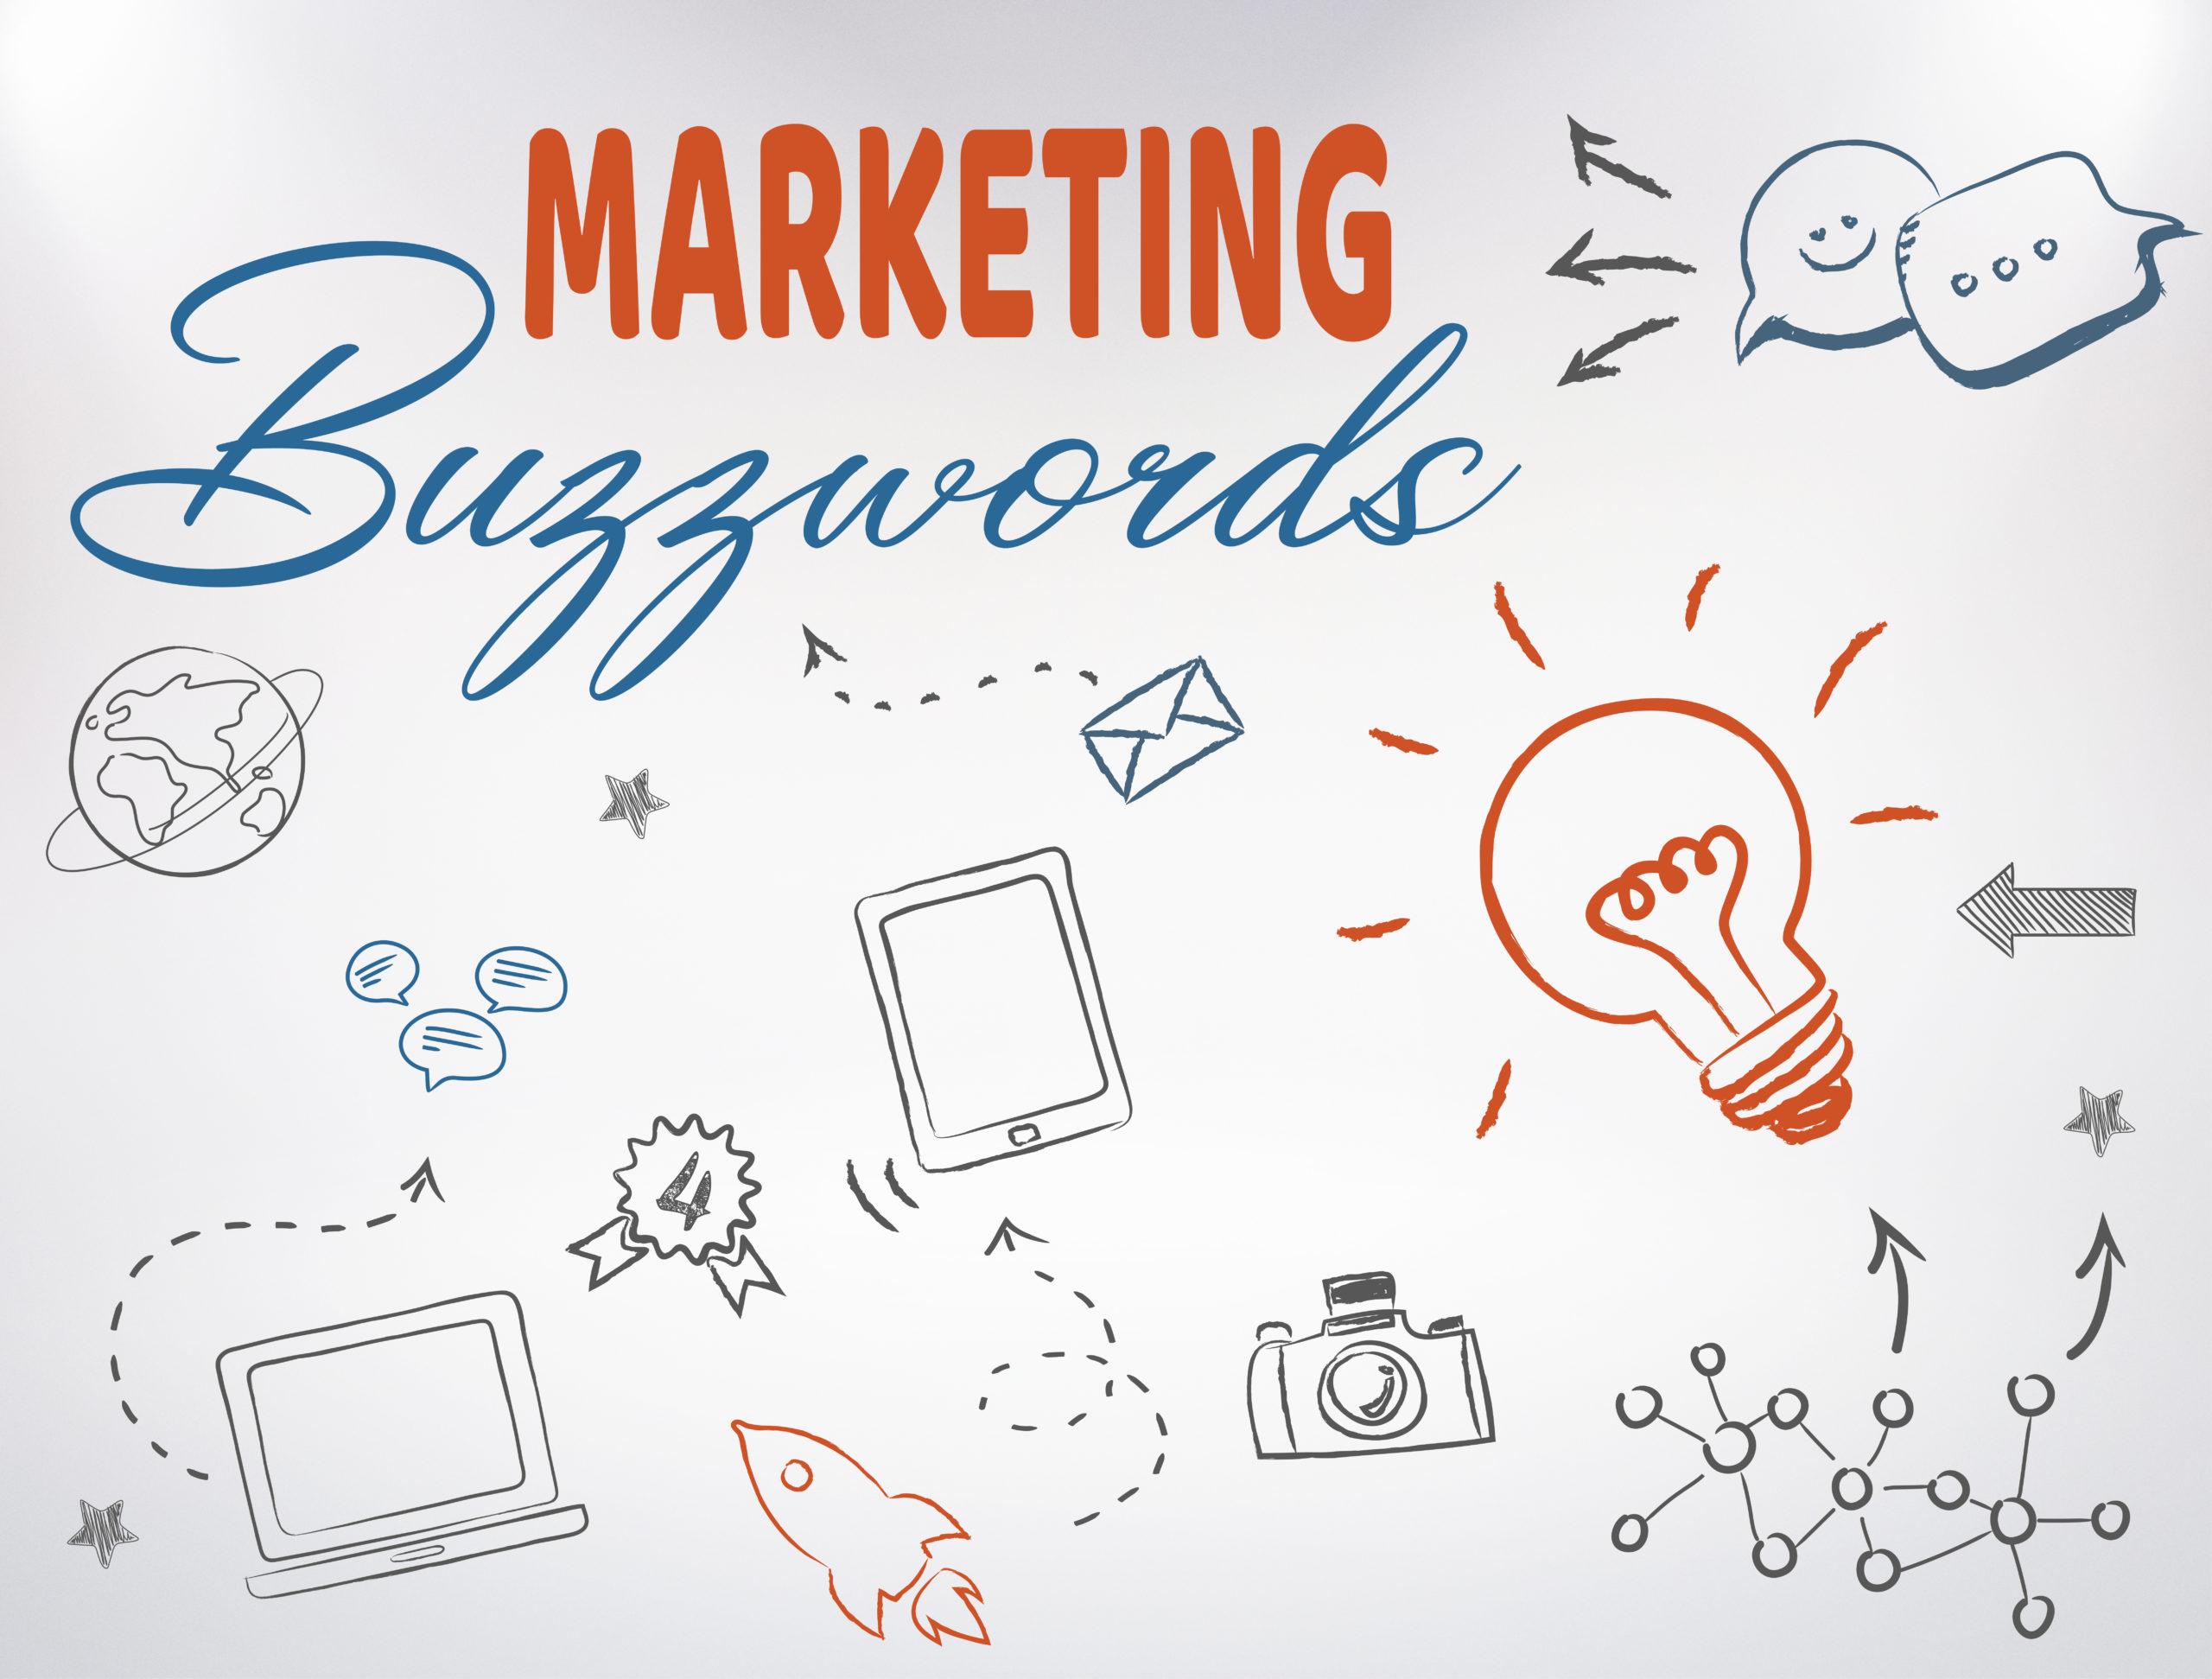 Marketing-Buzzwords